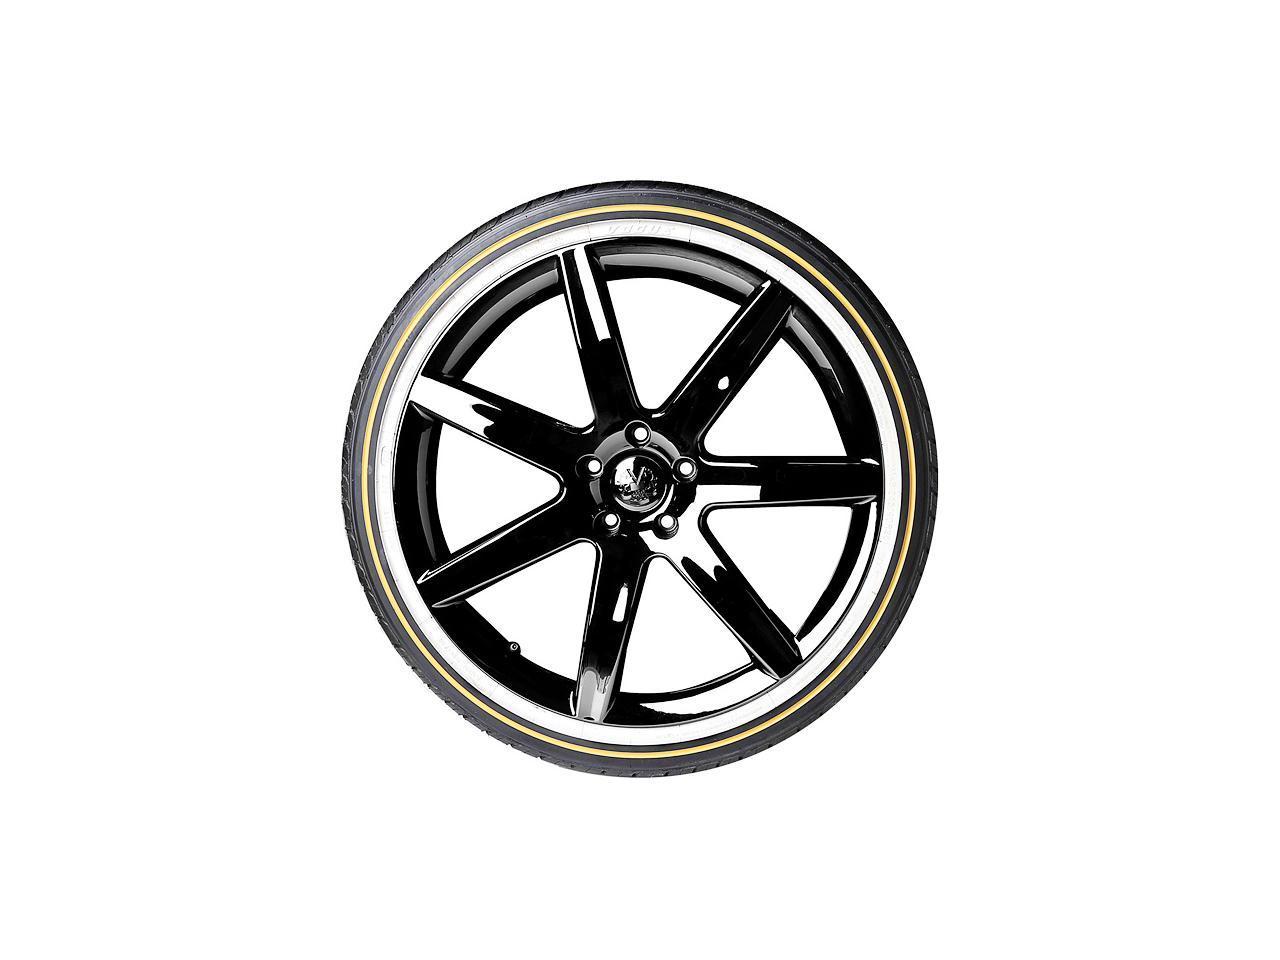 vogue tires radial built sidewall